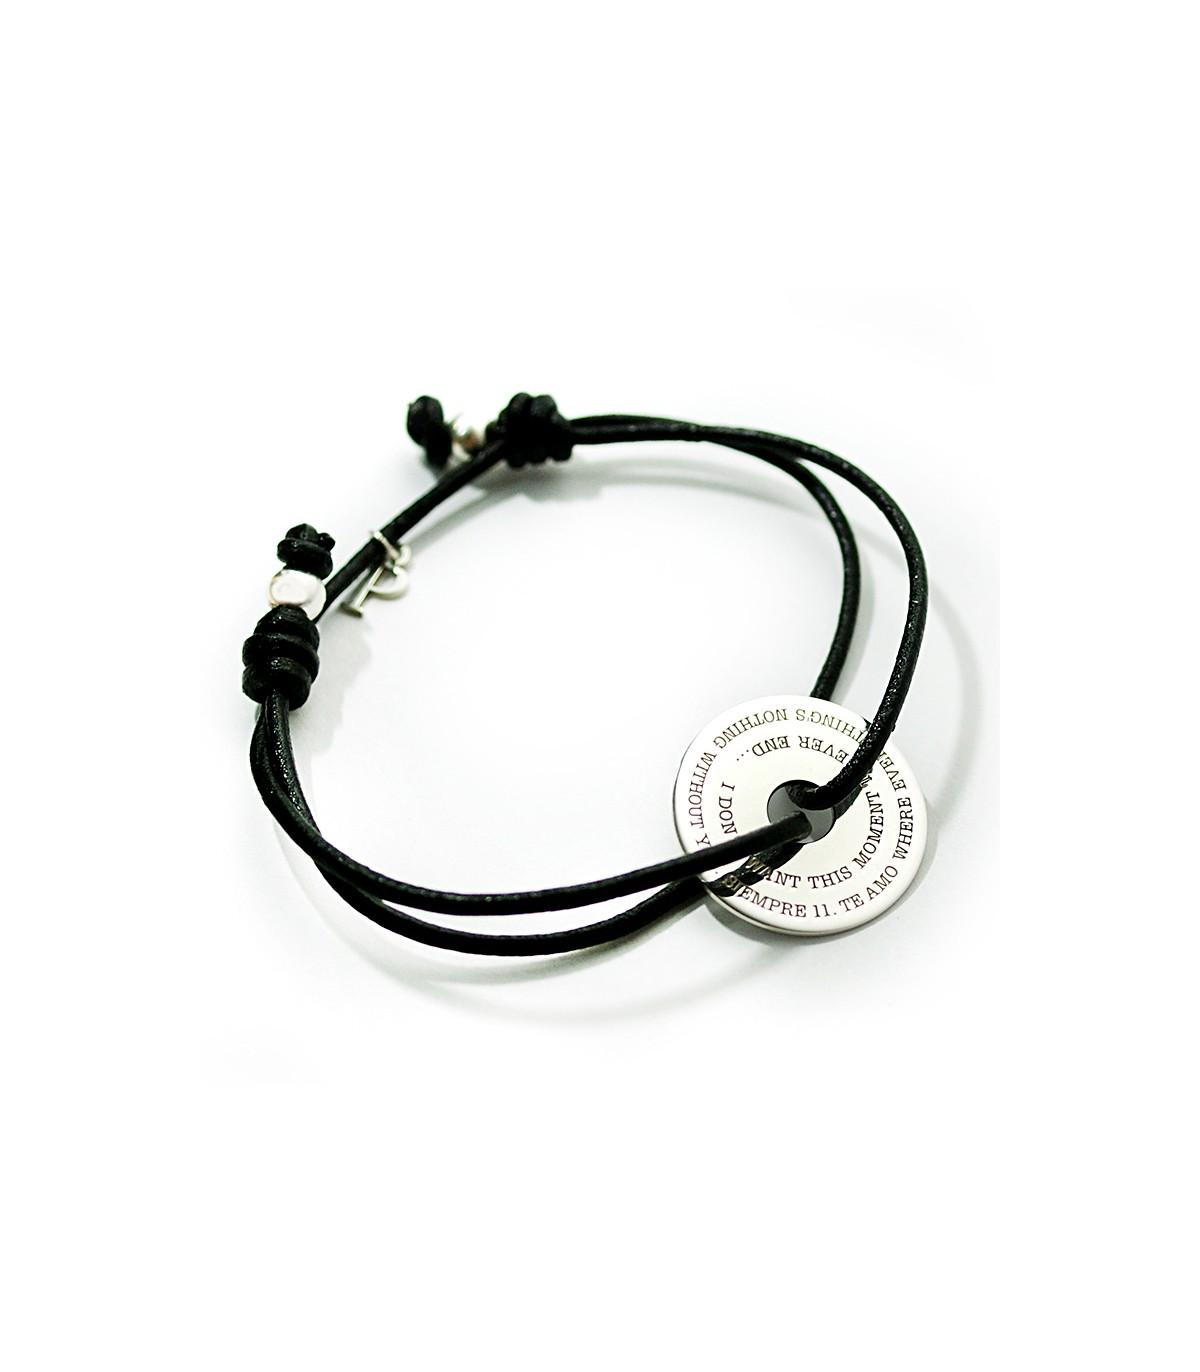 e3654828858c ... Joyas para hombre     Pulsera personalizada Rondella cuero. pulsera  personalizada ...